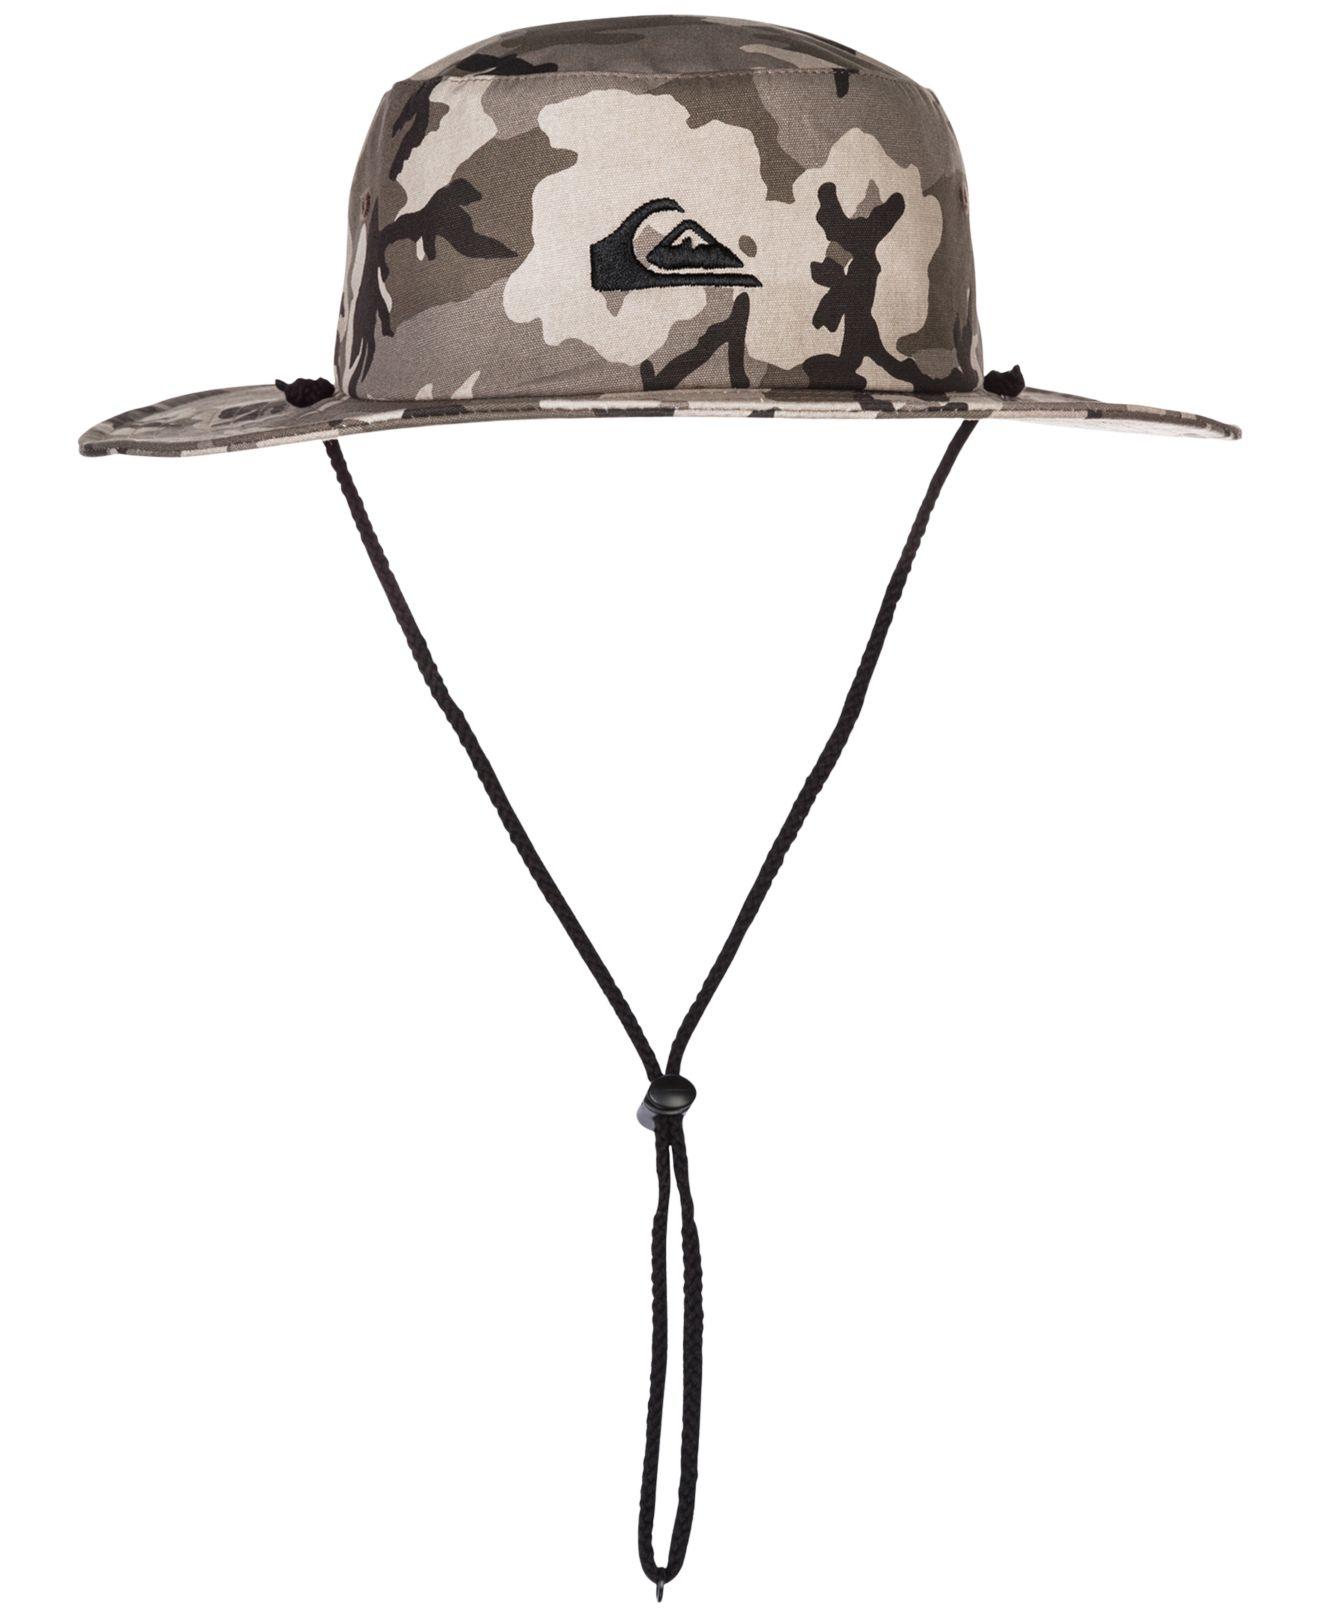 c3c09cca1bc36b ... sale lyst quiksilver bushmaster hat in green for men 2ec33 0b131